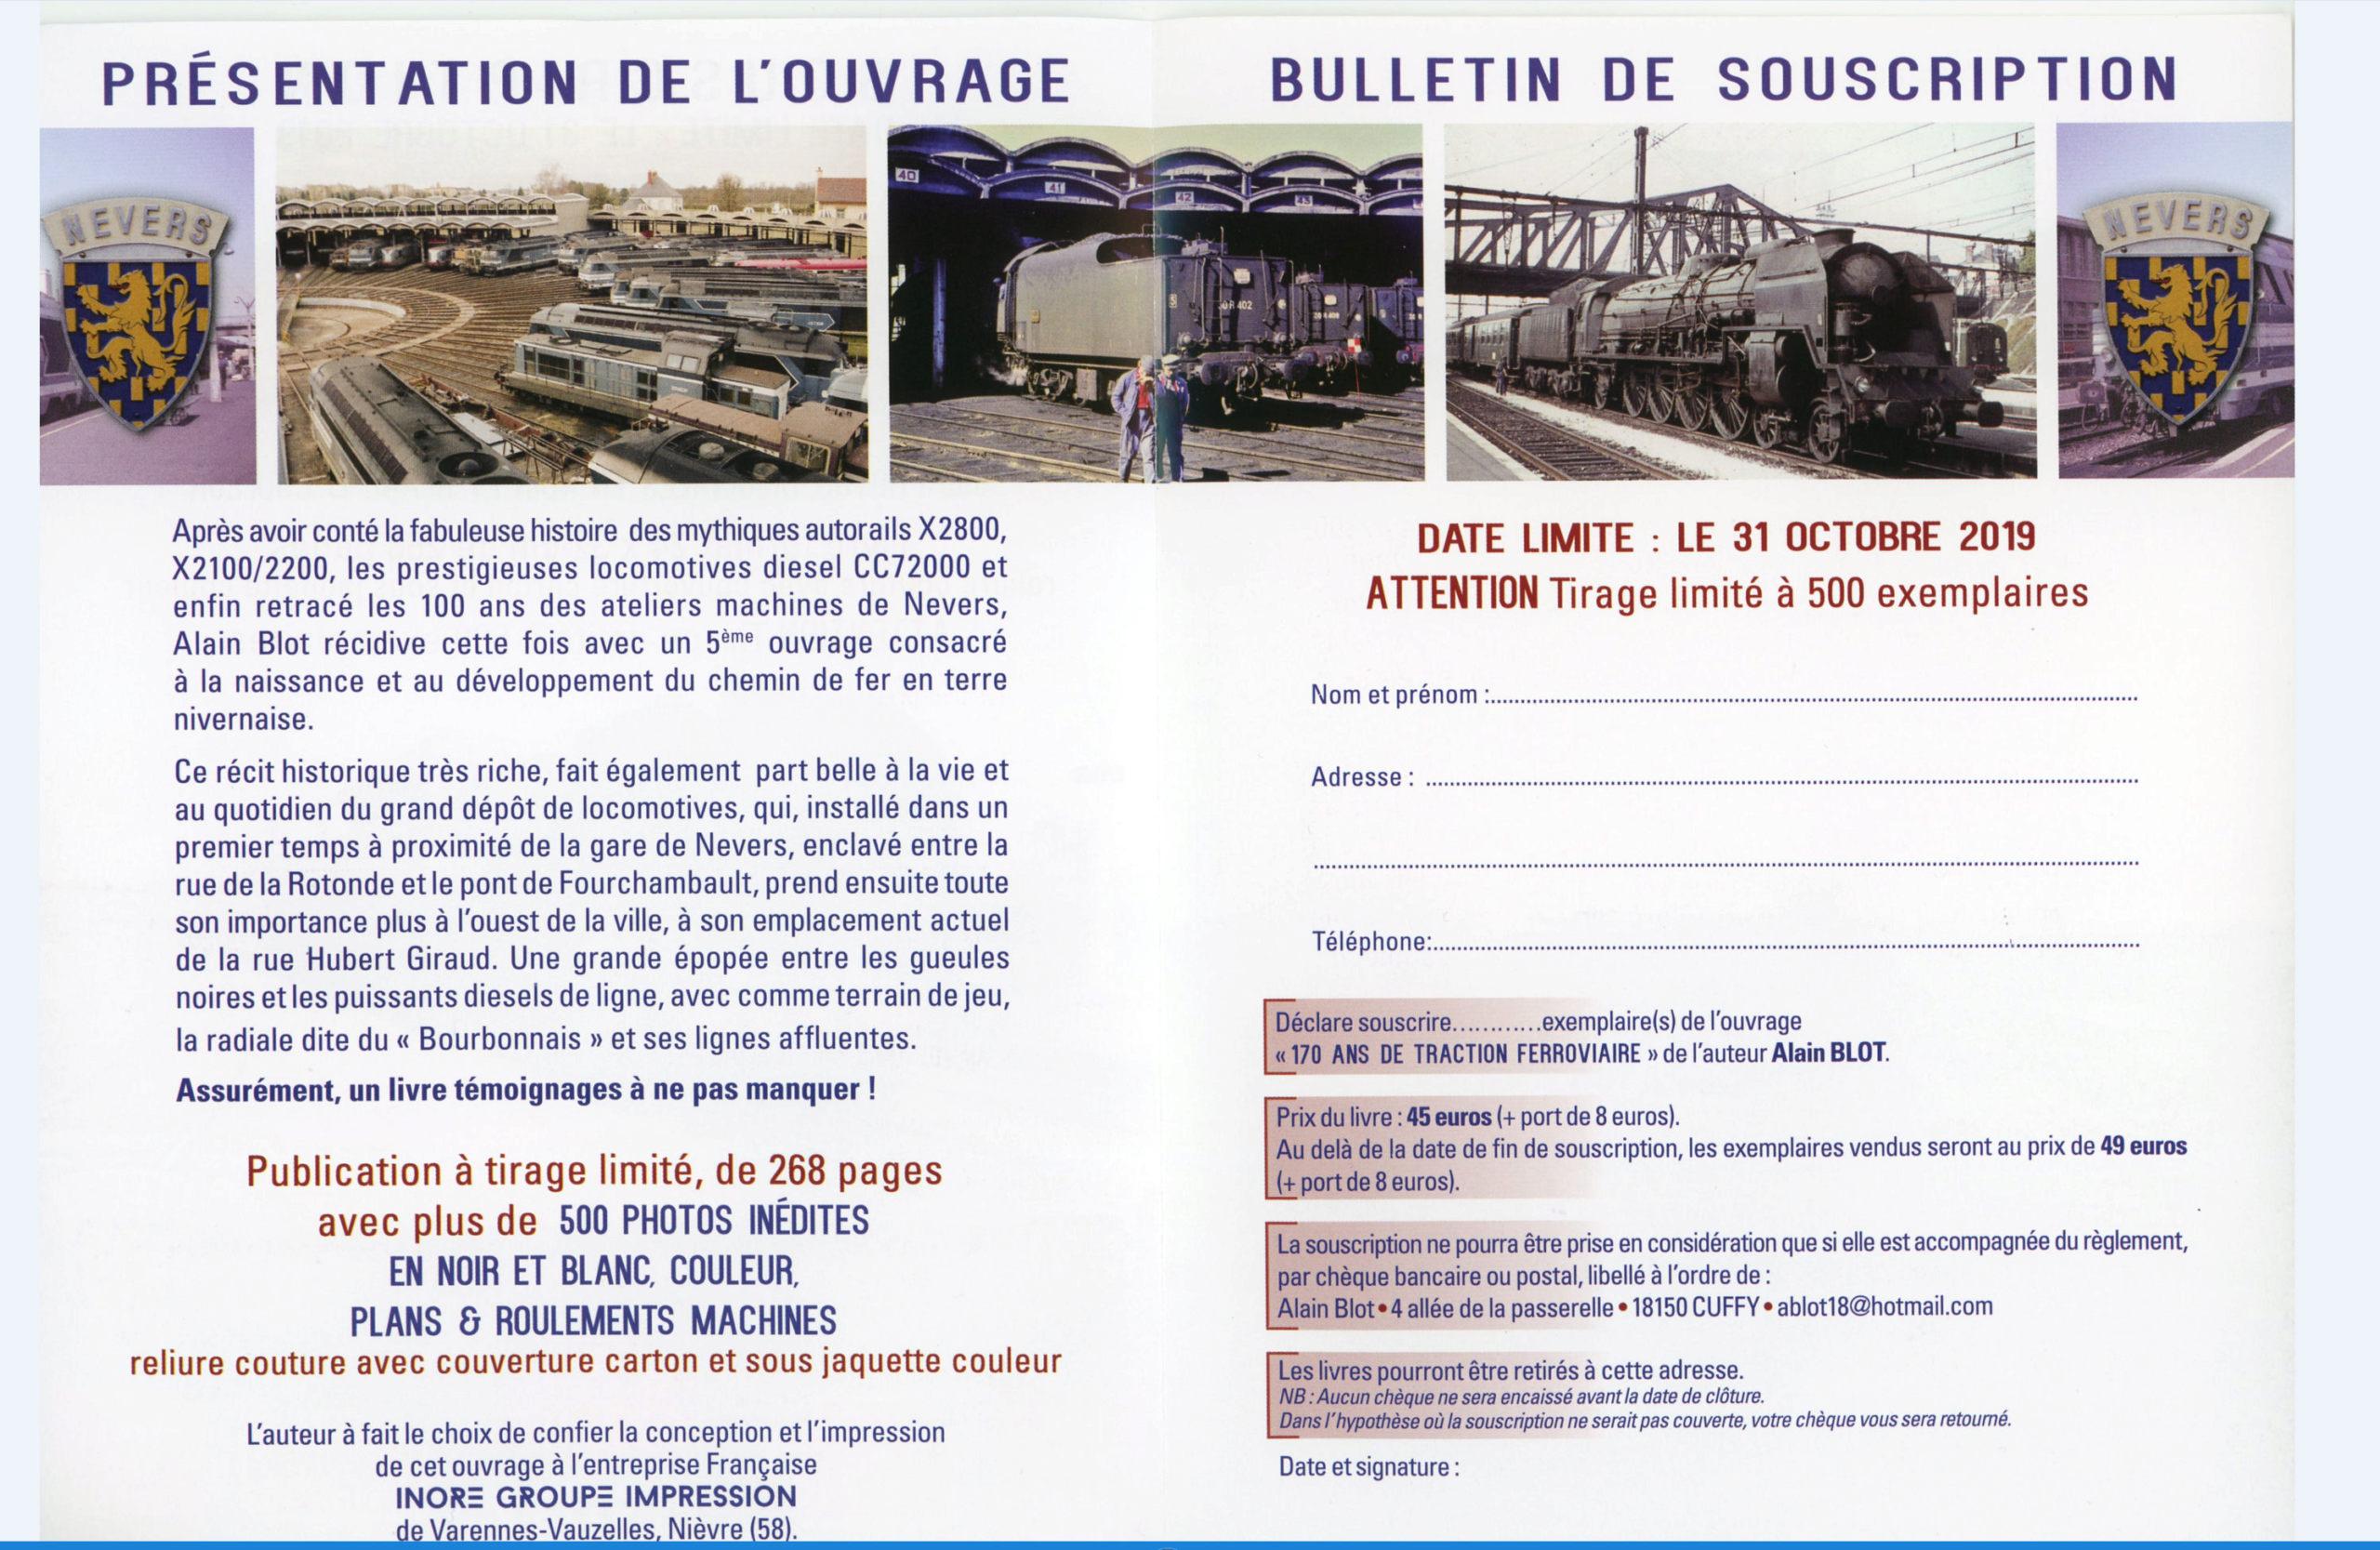 Nevers - 170 ans de traction ferroviaire Image217